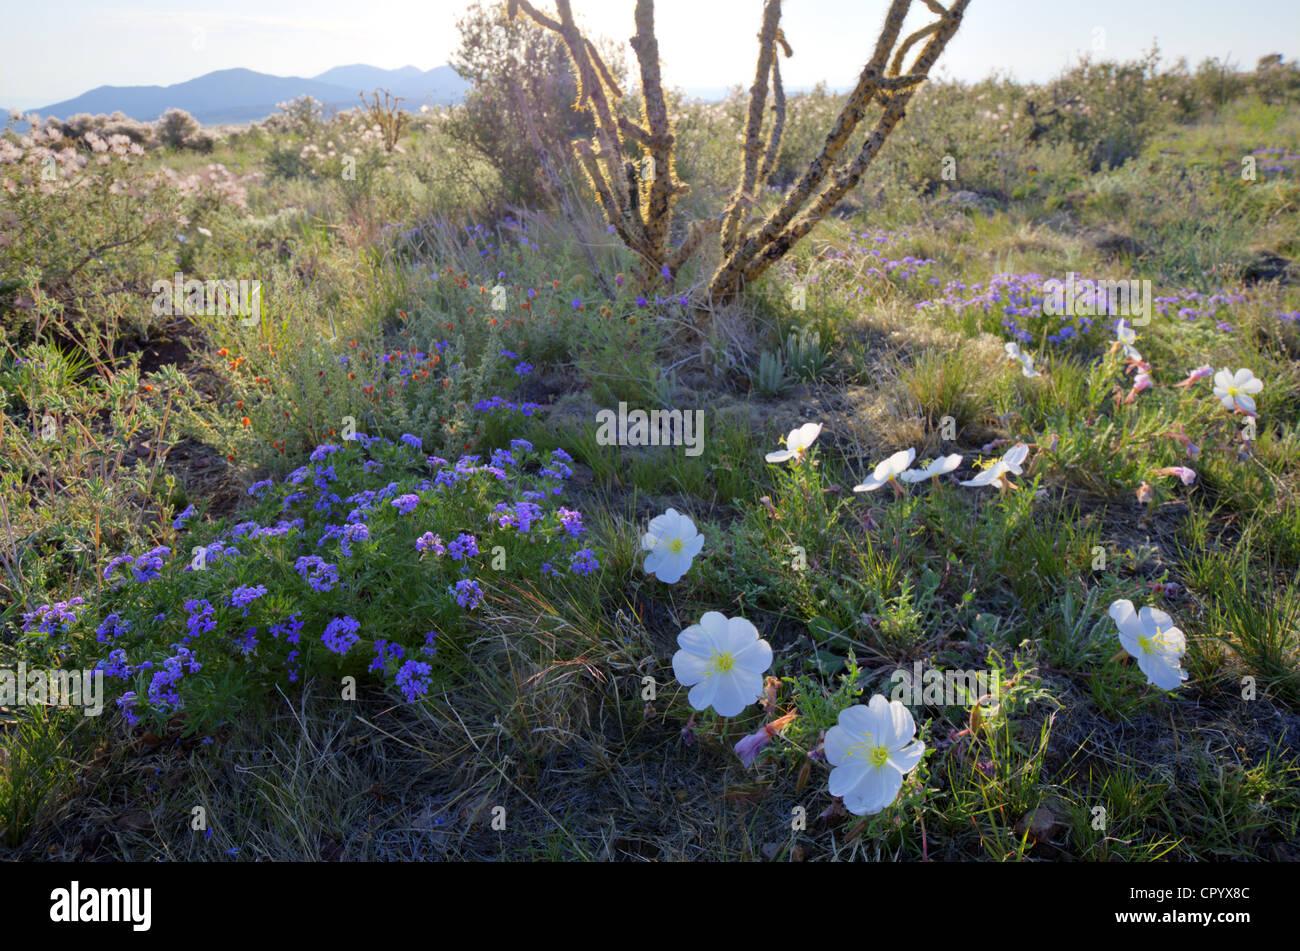 New mexico socorro county magdalena - Mixed Wildflowers Verbena Evening Primrose And Globe Mallow East Of Magdalena Mountains Socorro County New Mexico Usa